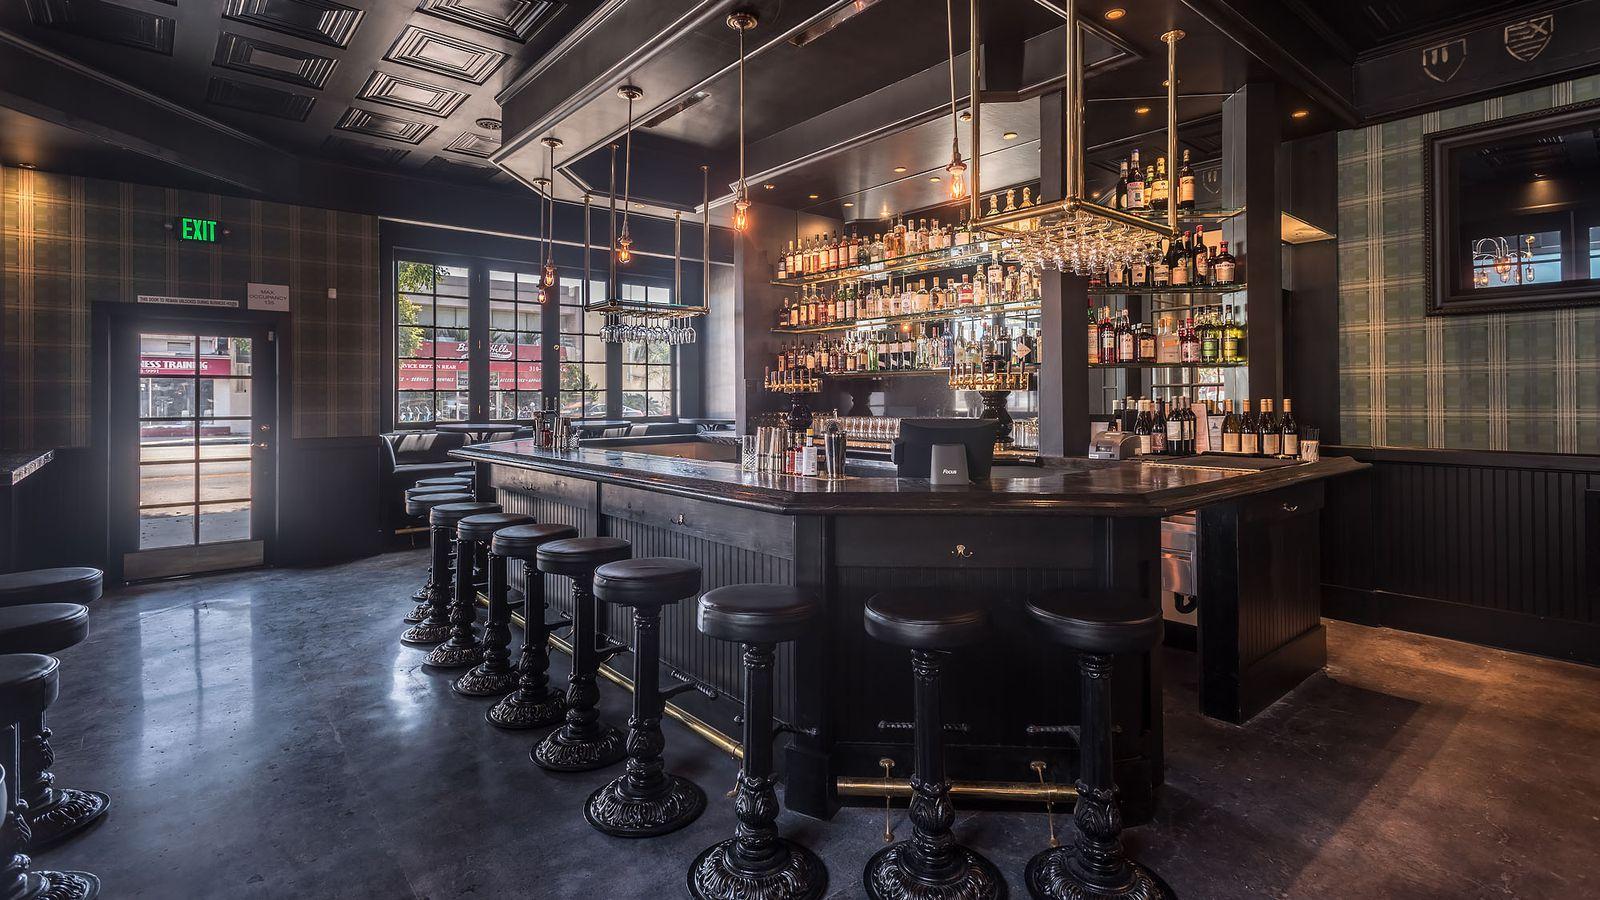 The Stalking Horse Is West La S New Craft Beer British Pub